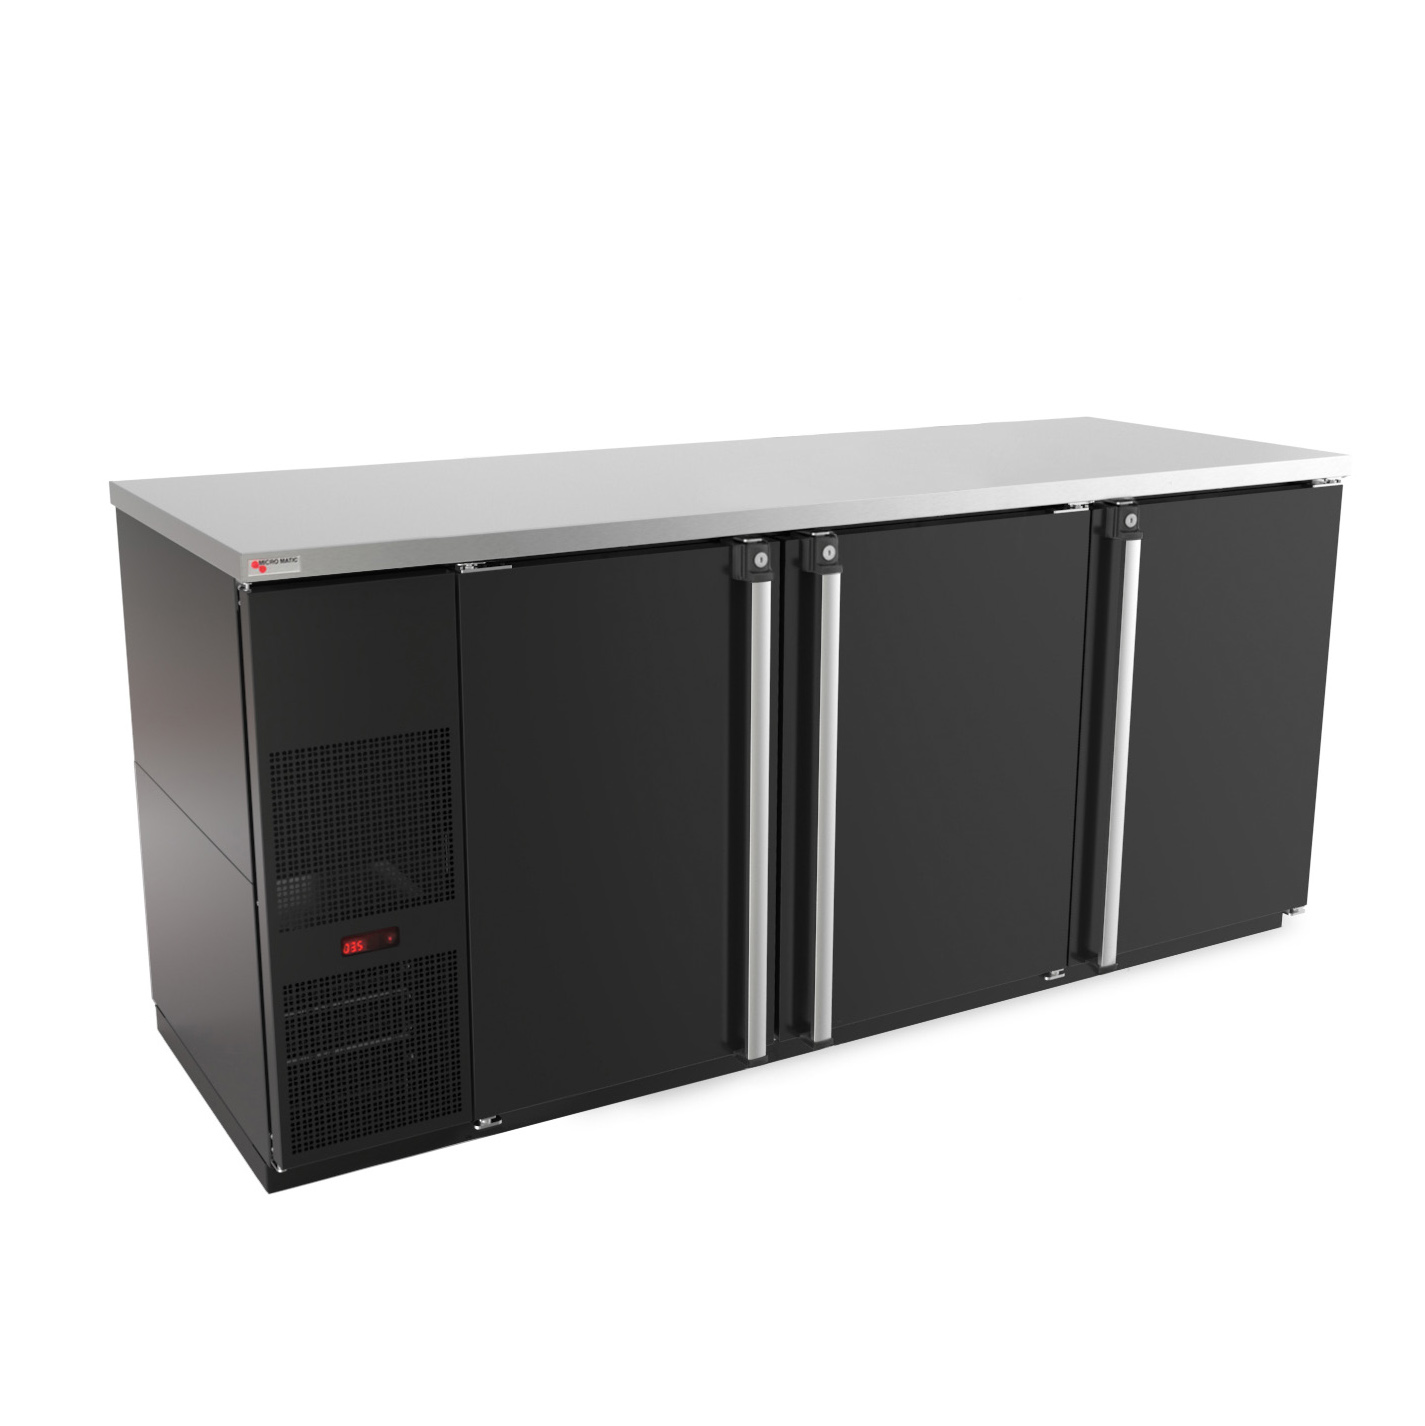 Micro Matic USA MBB78-E back bar cabinet, refrigerated